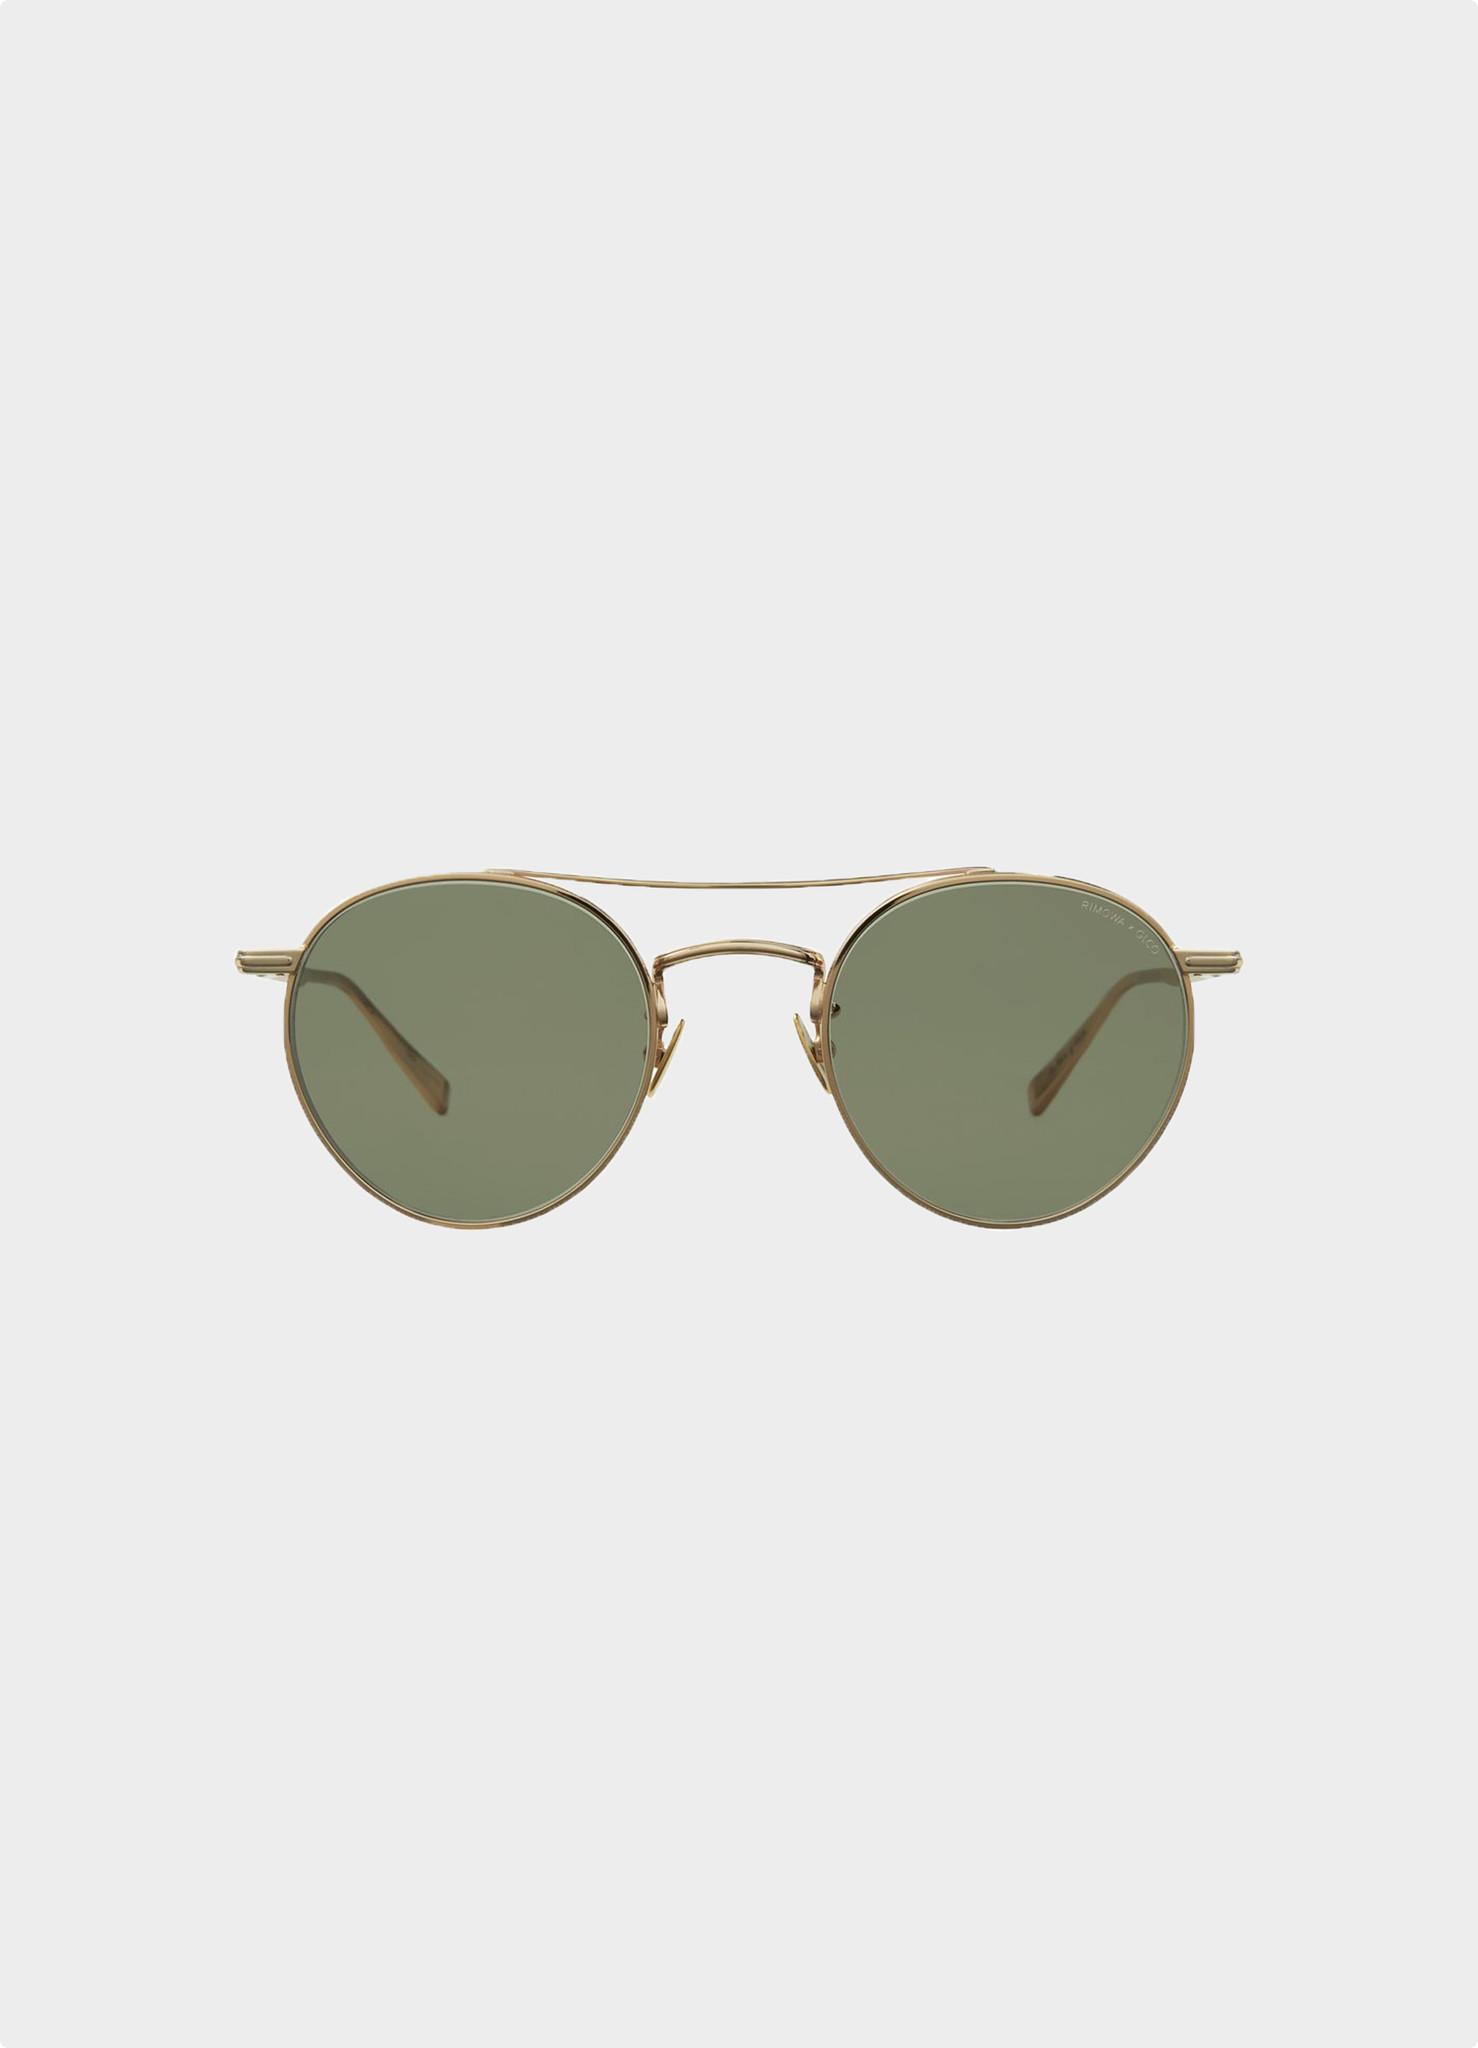 RIMOWA X GLCO M 49 Gold/Semi-Flat  Green